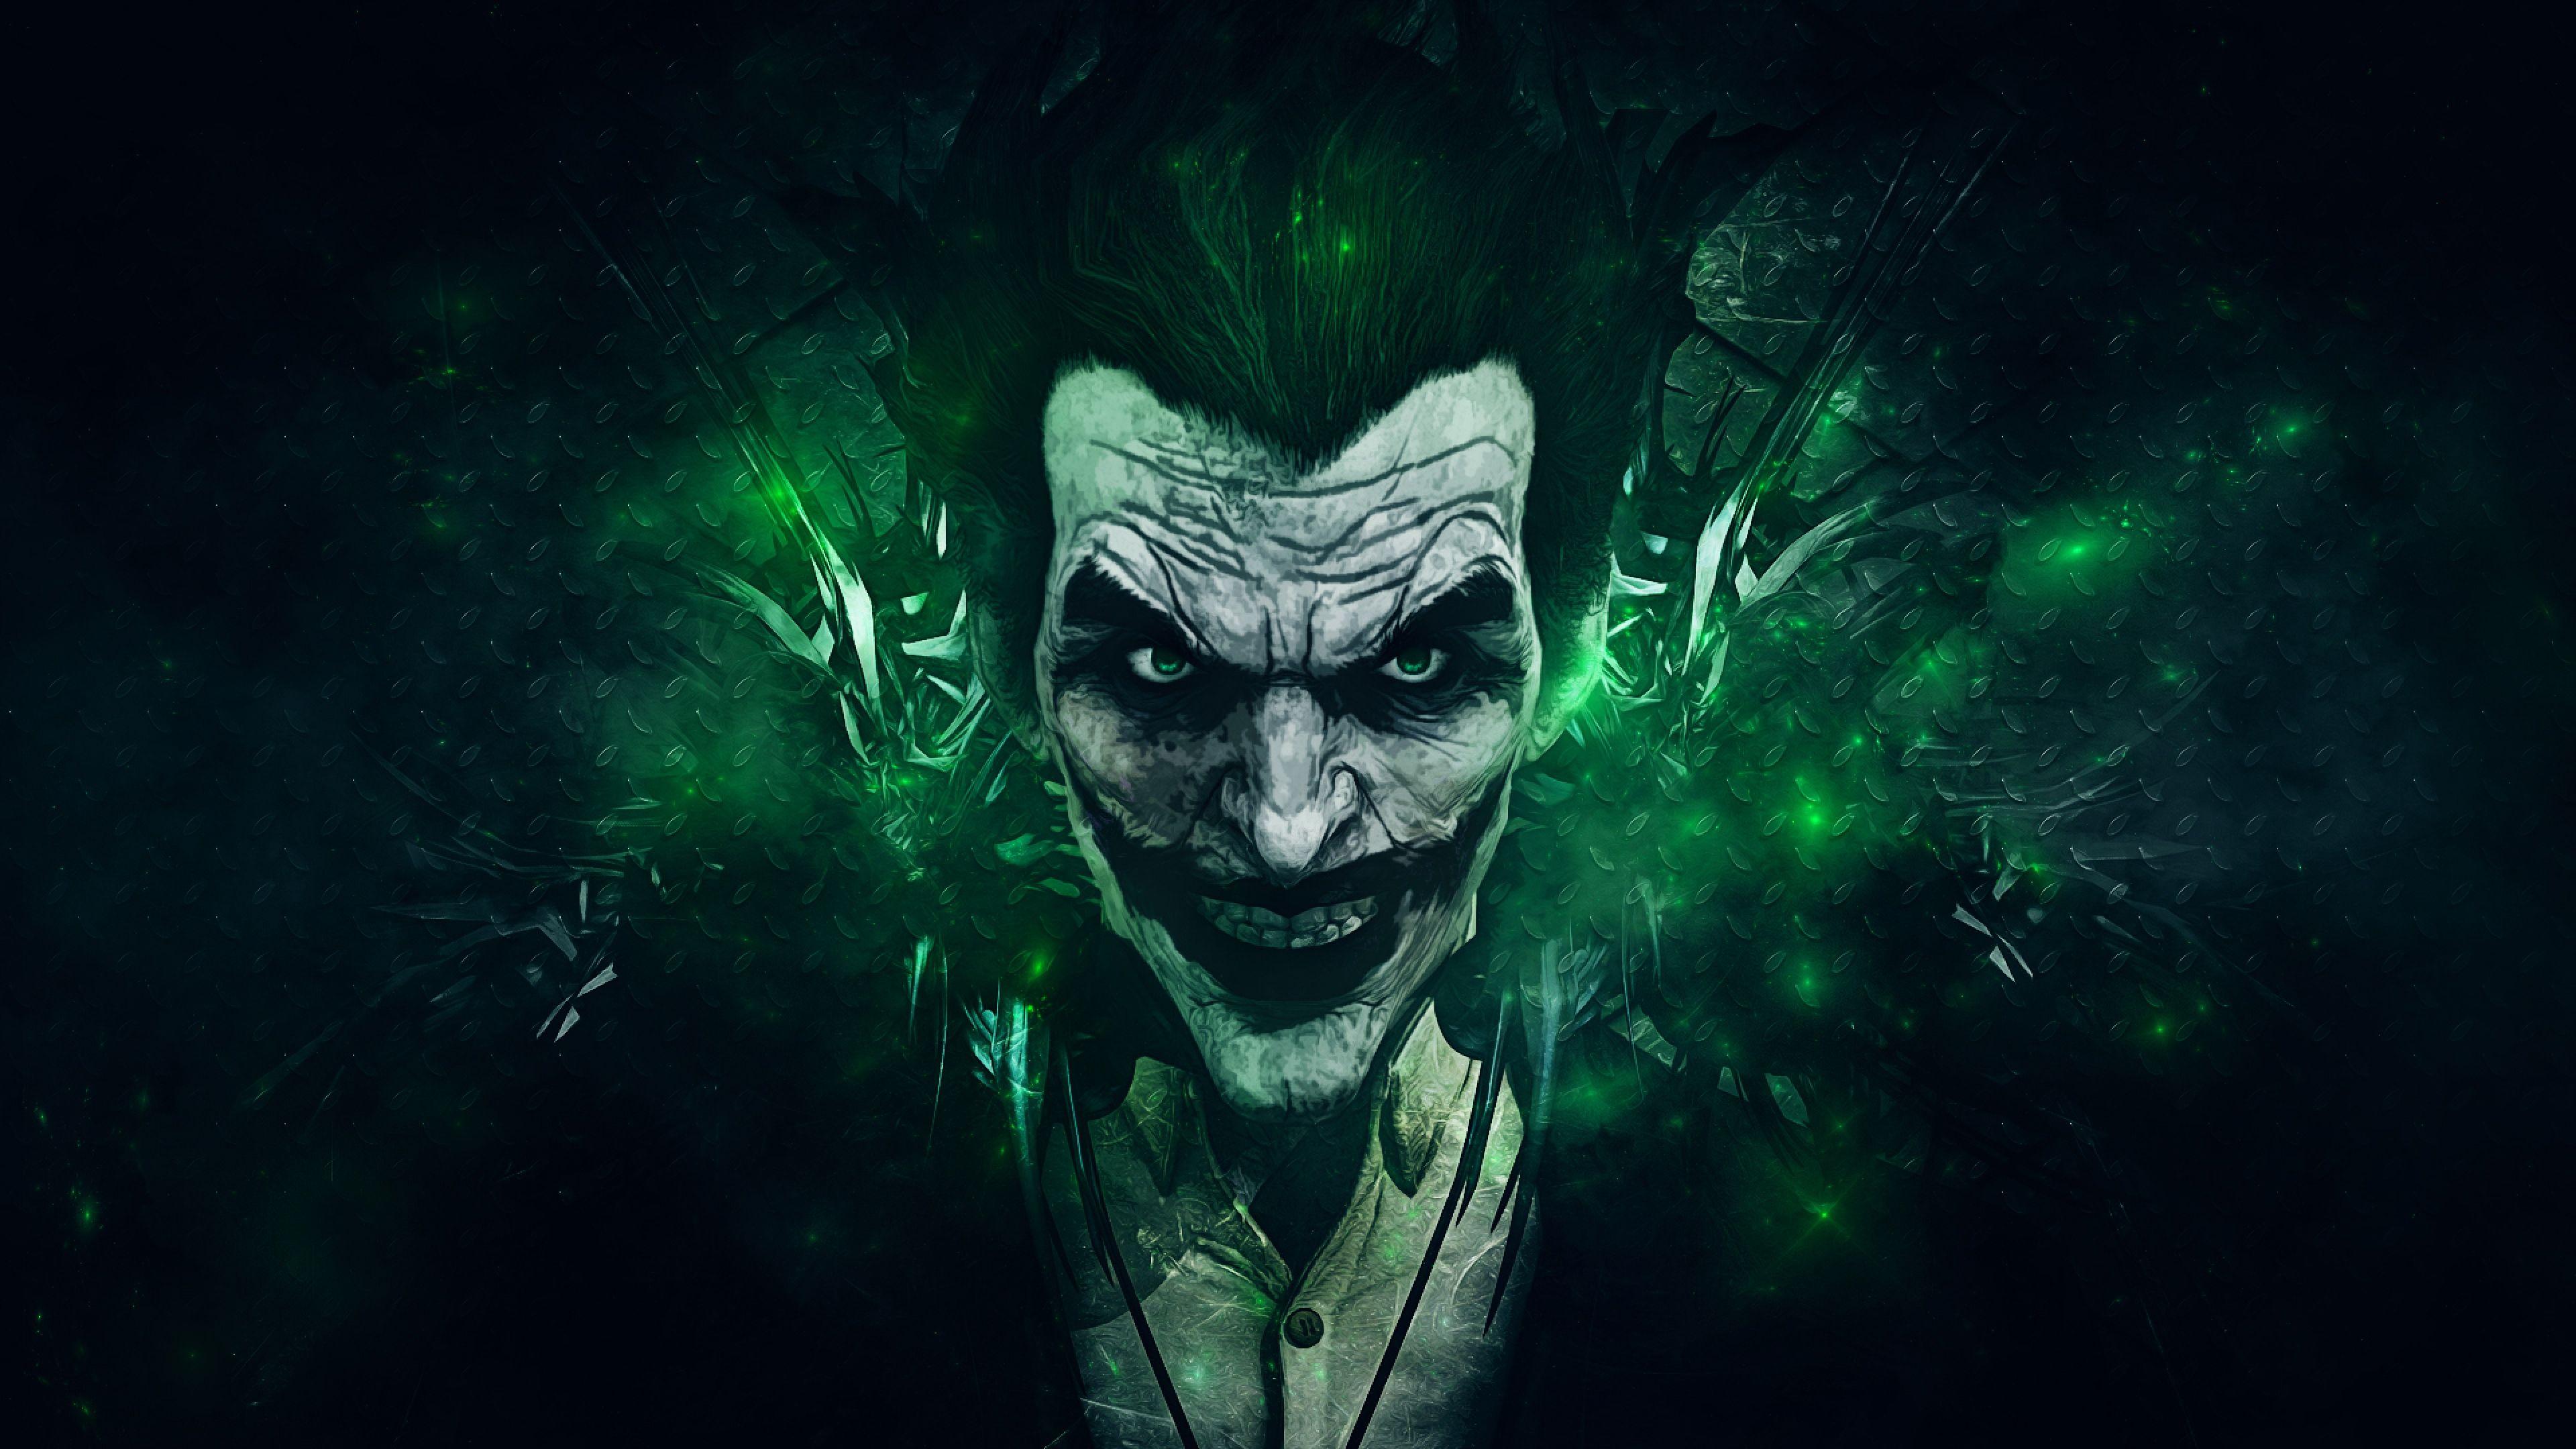 Joker Arkham Knight Batman Asylum Origins Dubstep Hd